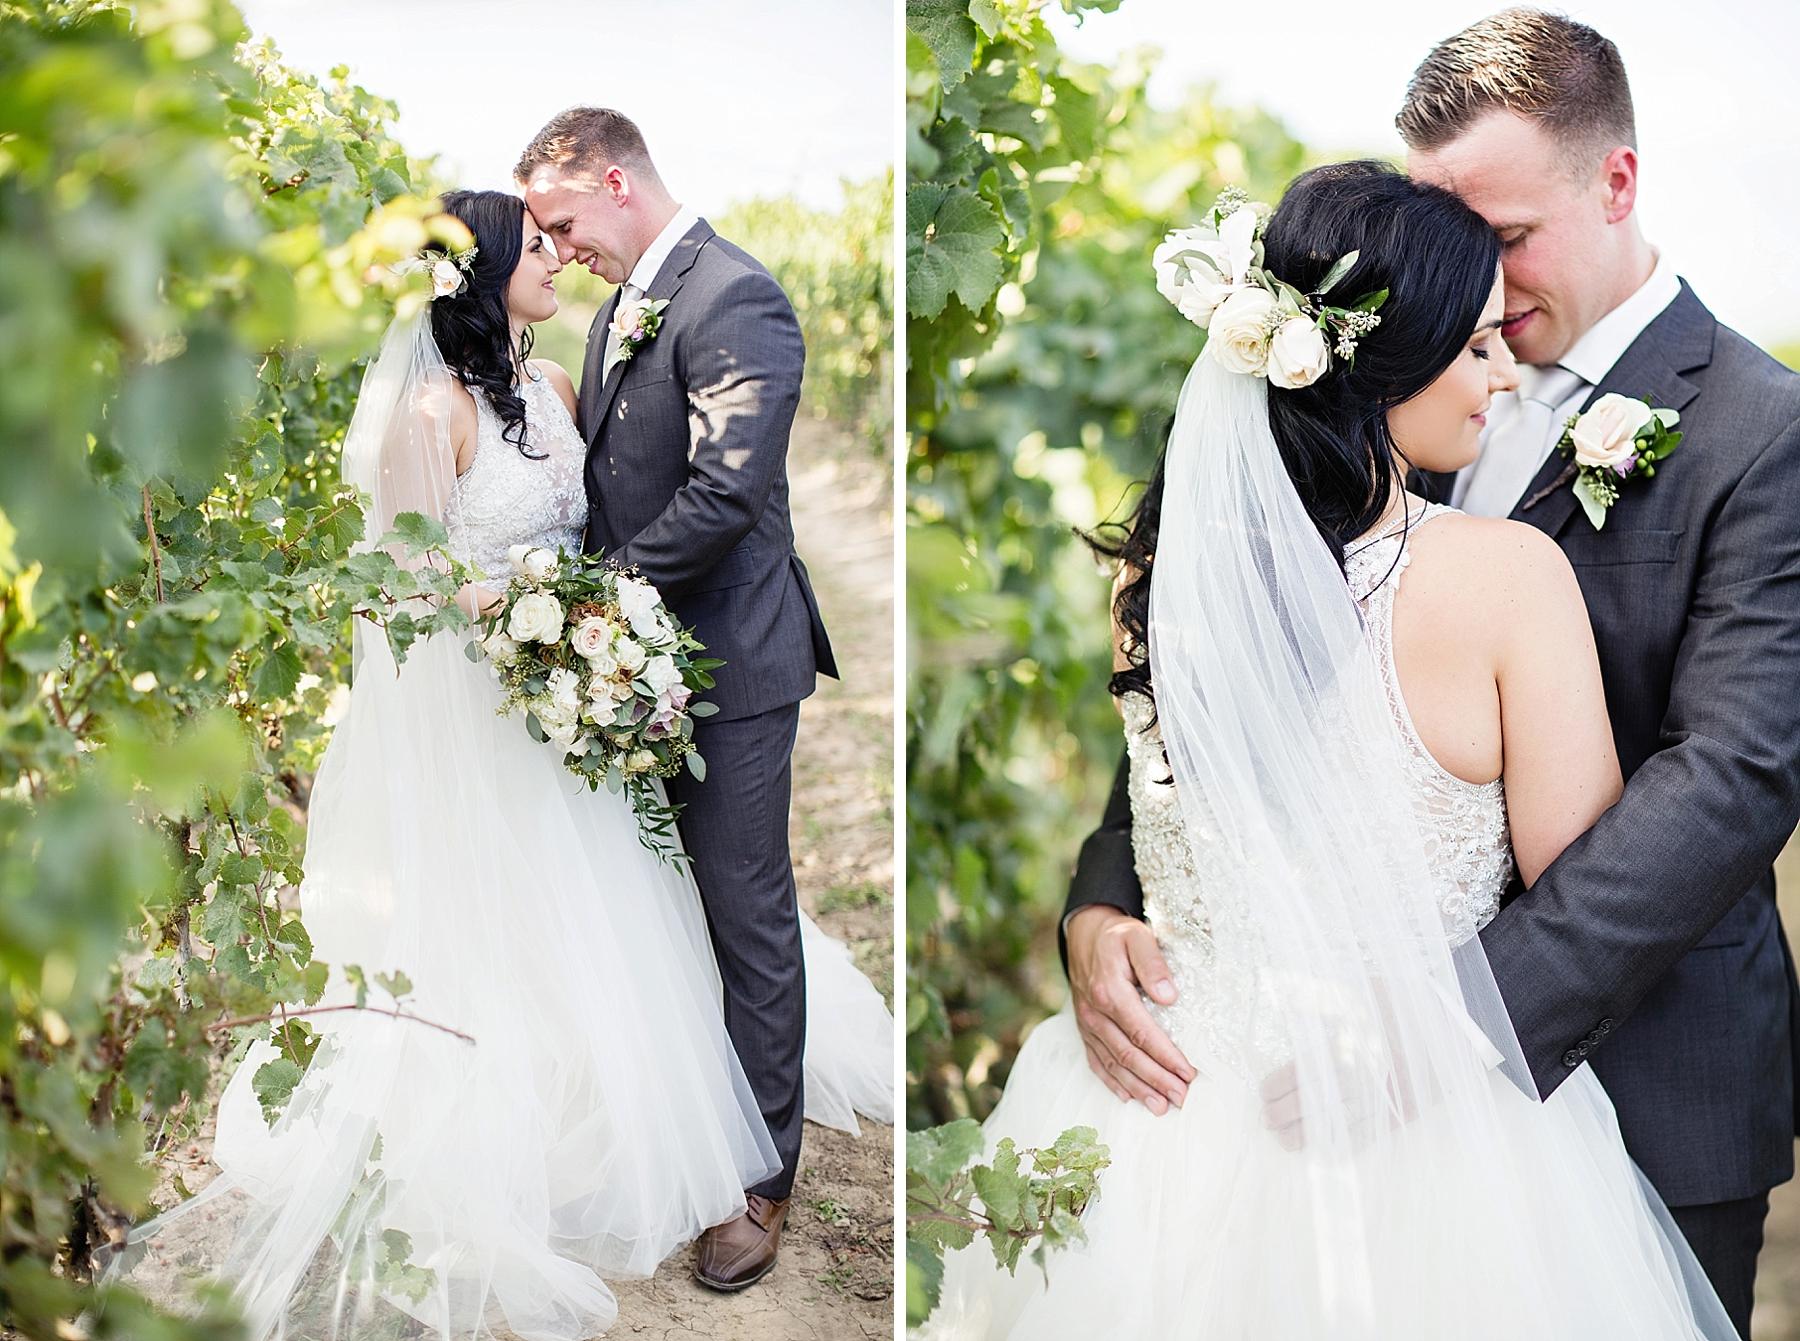 windsor-wedding-photographer-sprucewood-shores-winery-wedding-niagara-on-the-lake-wedding-photographer-eryn-shea-photography_0045.jpg